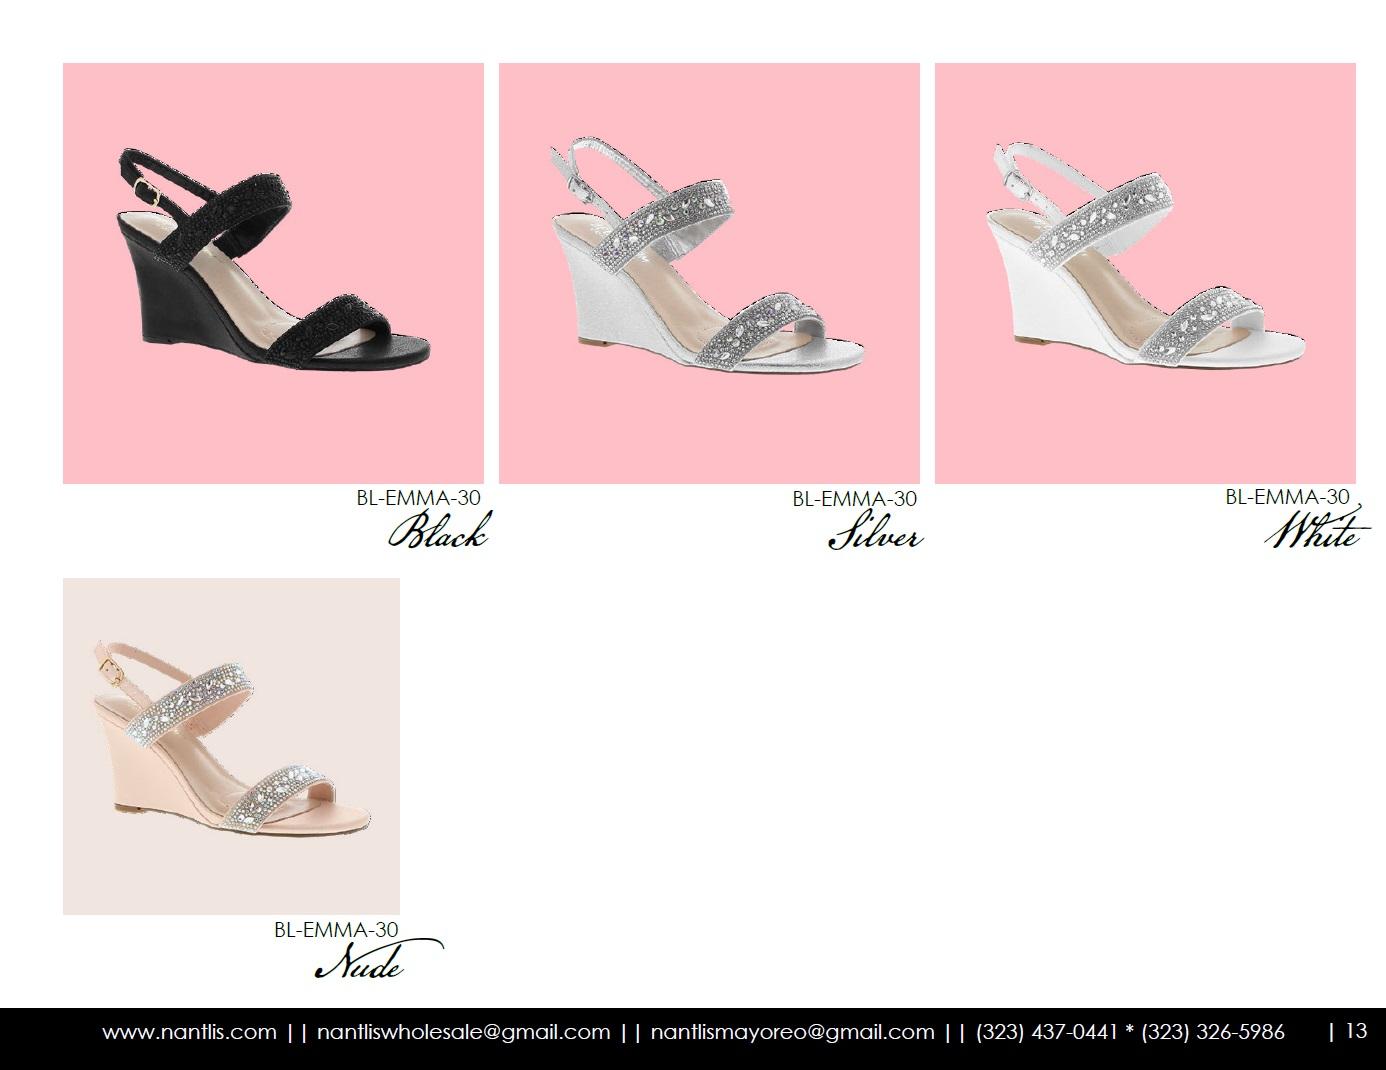 Nantlis Vol BL50 Zapatos de Mujer mayoreo Catalogo Wholesale womens Shoes_Page_13